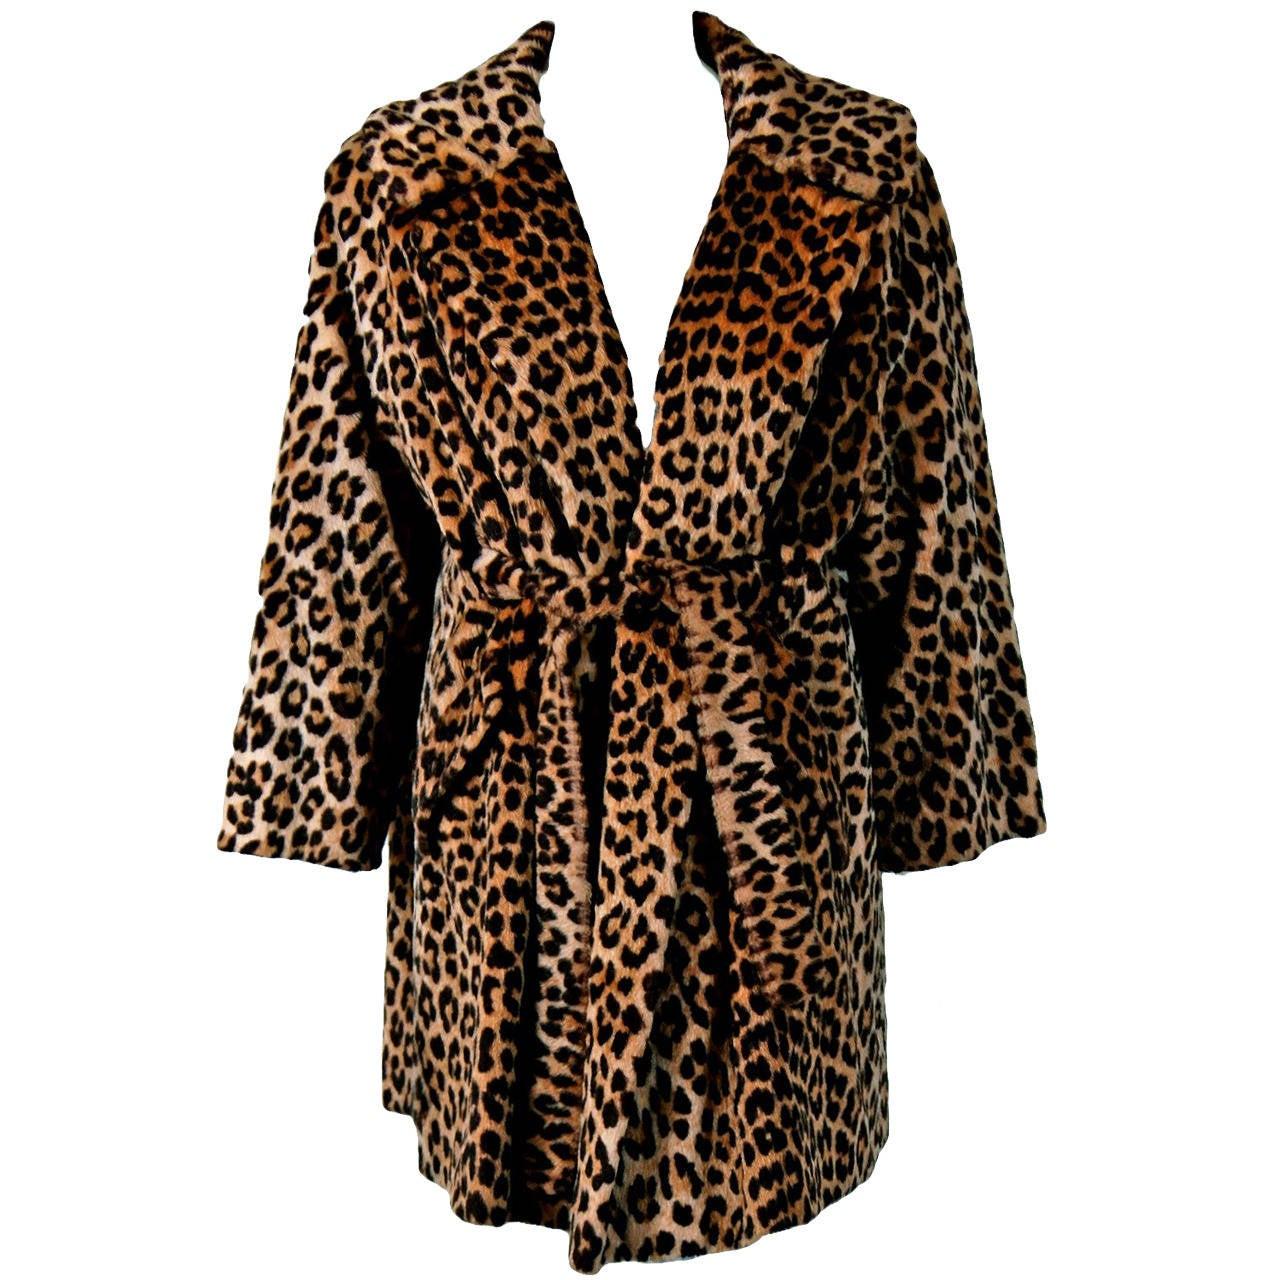 73715de44603 1960's Gorgeous Leopard Animal-Print Faux Fur Belted Trench Coat Jacket For  Sale